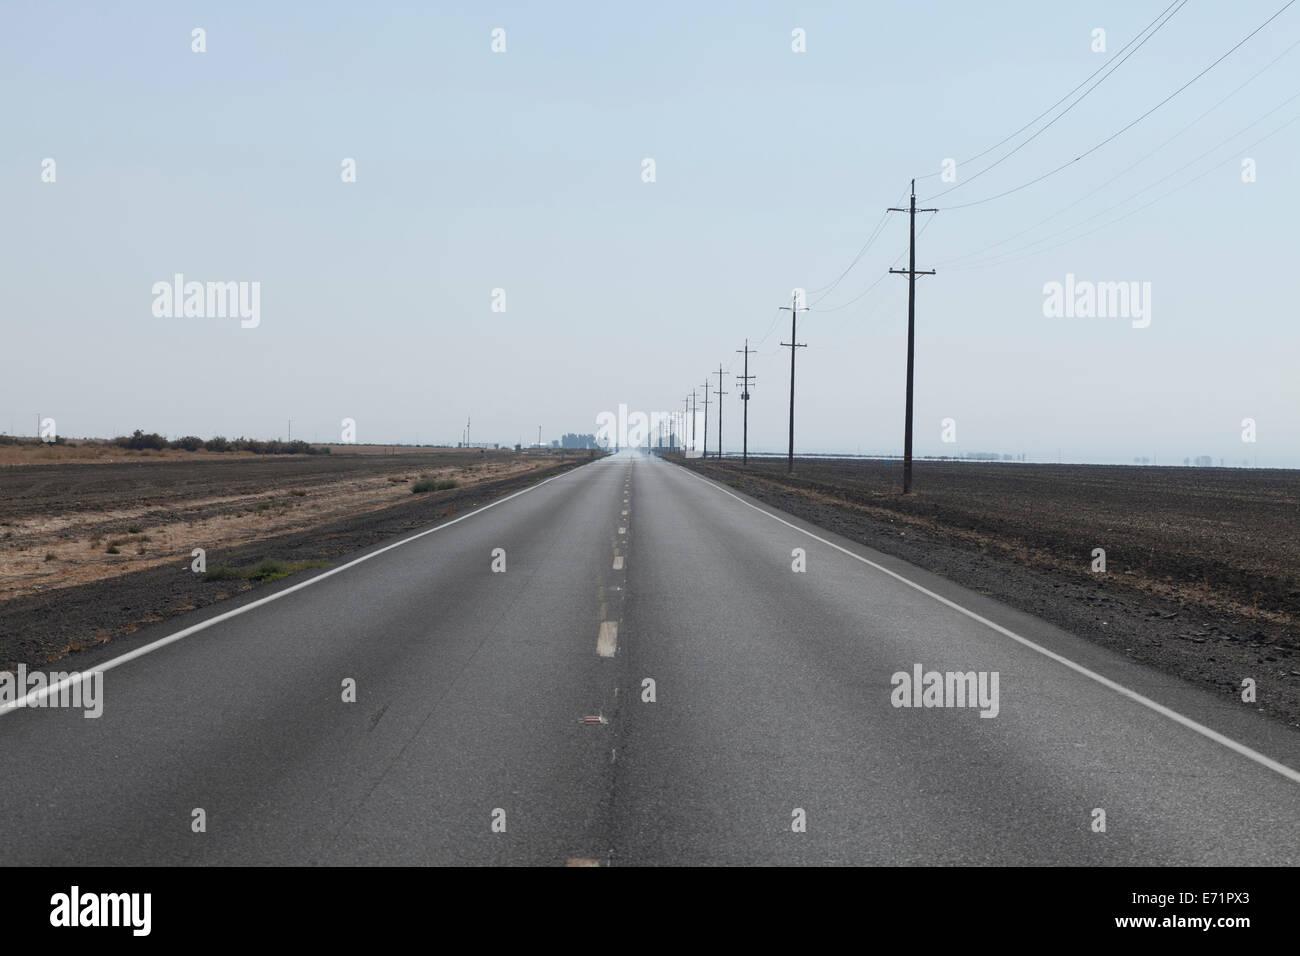 Rural highway fading into the horizon in San Joaquin Valley farmland - California USA - Stock Image